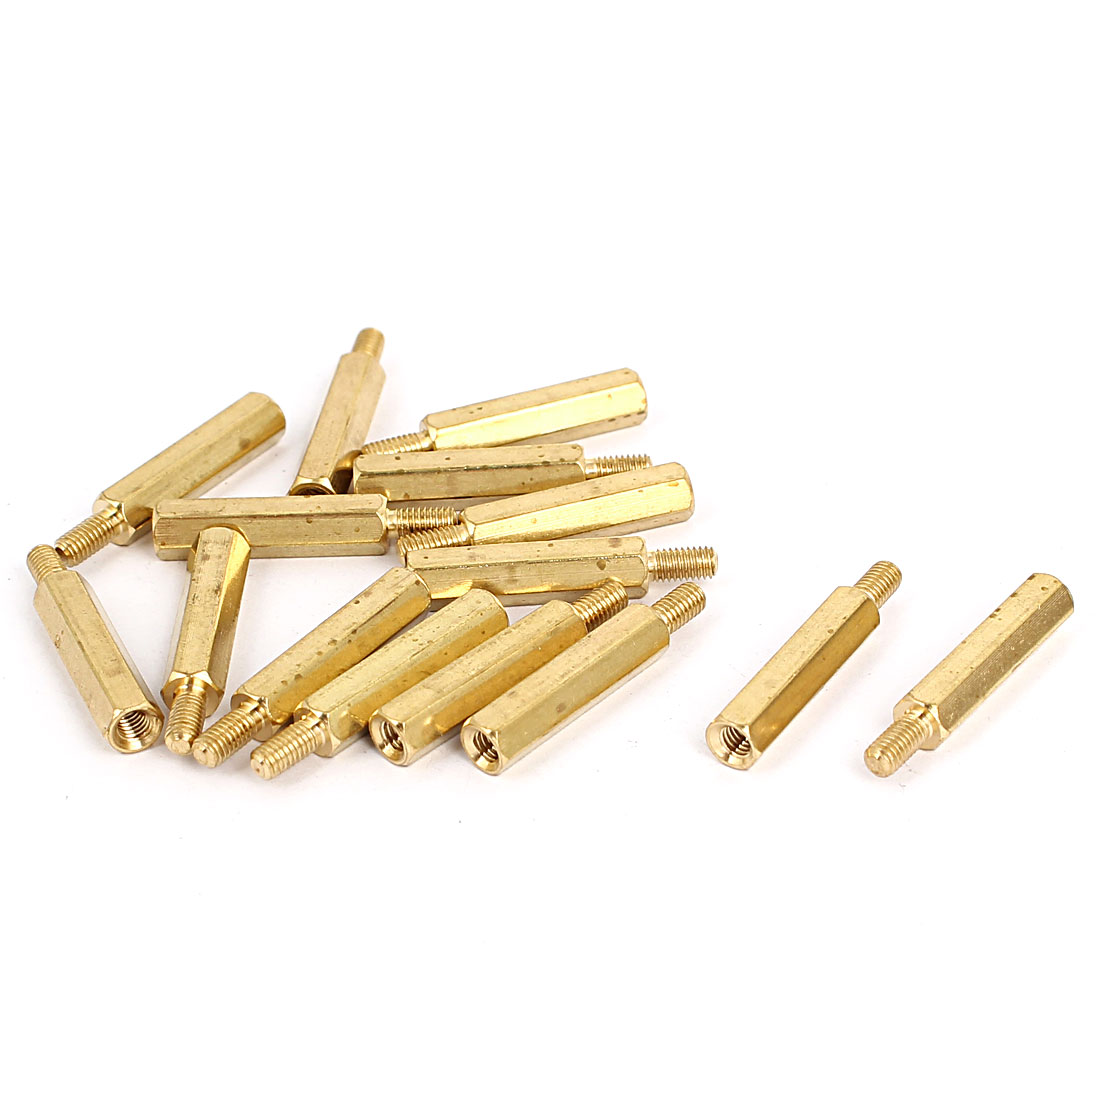 M3 Hexagonal Pillar Male to Female Thread PCB Standoff Spacer 20mm+6mm 15pcs